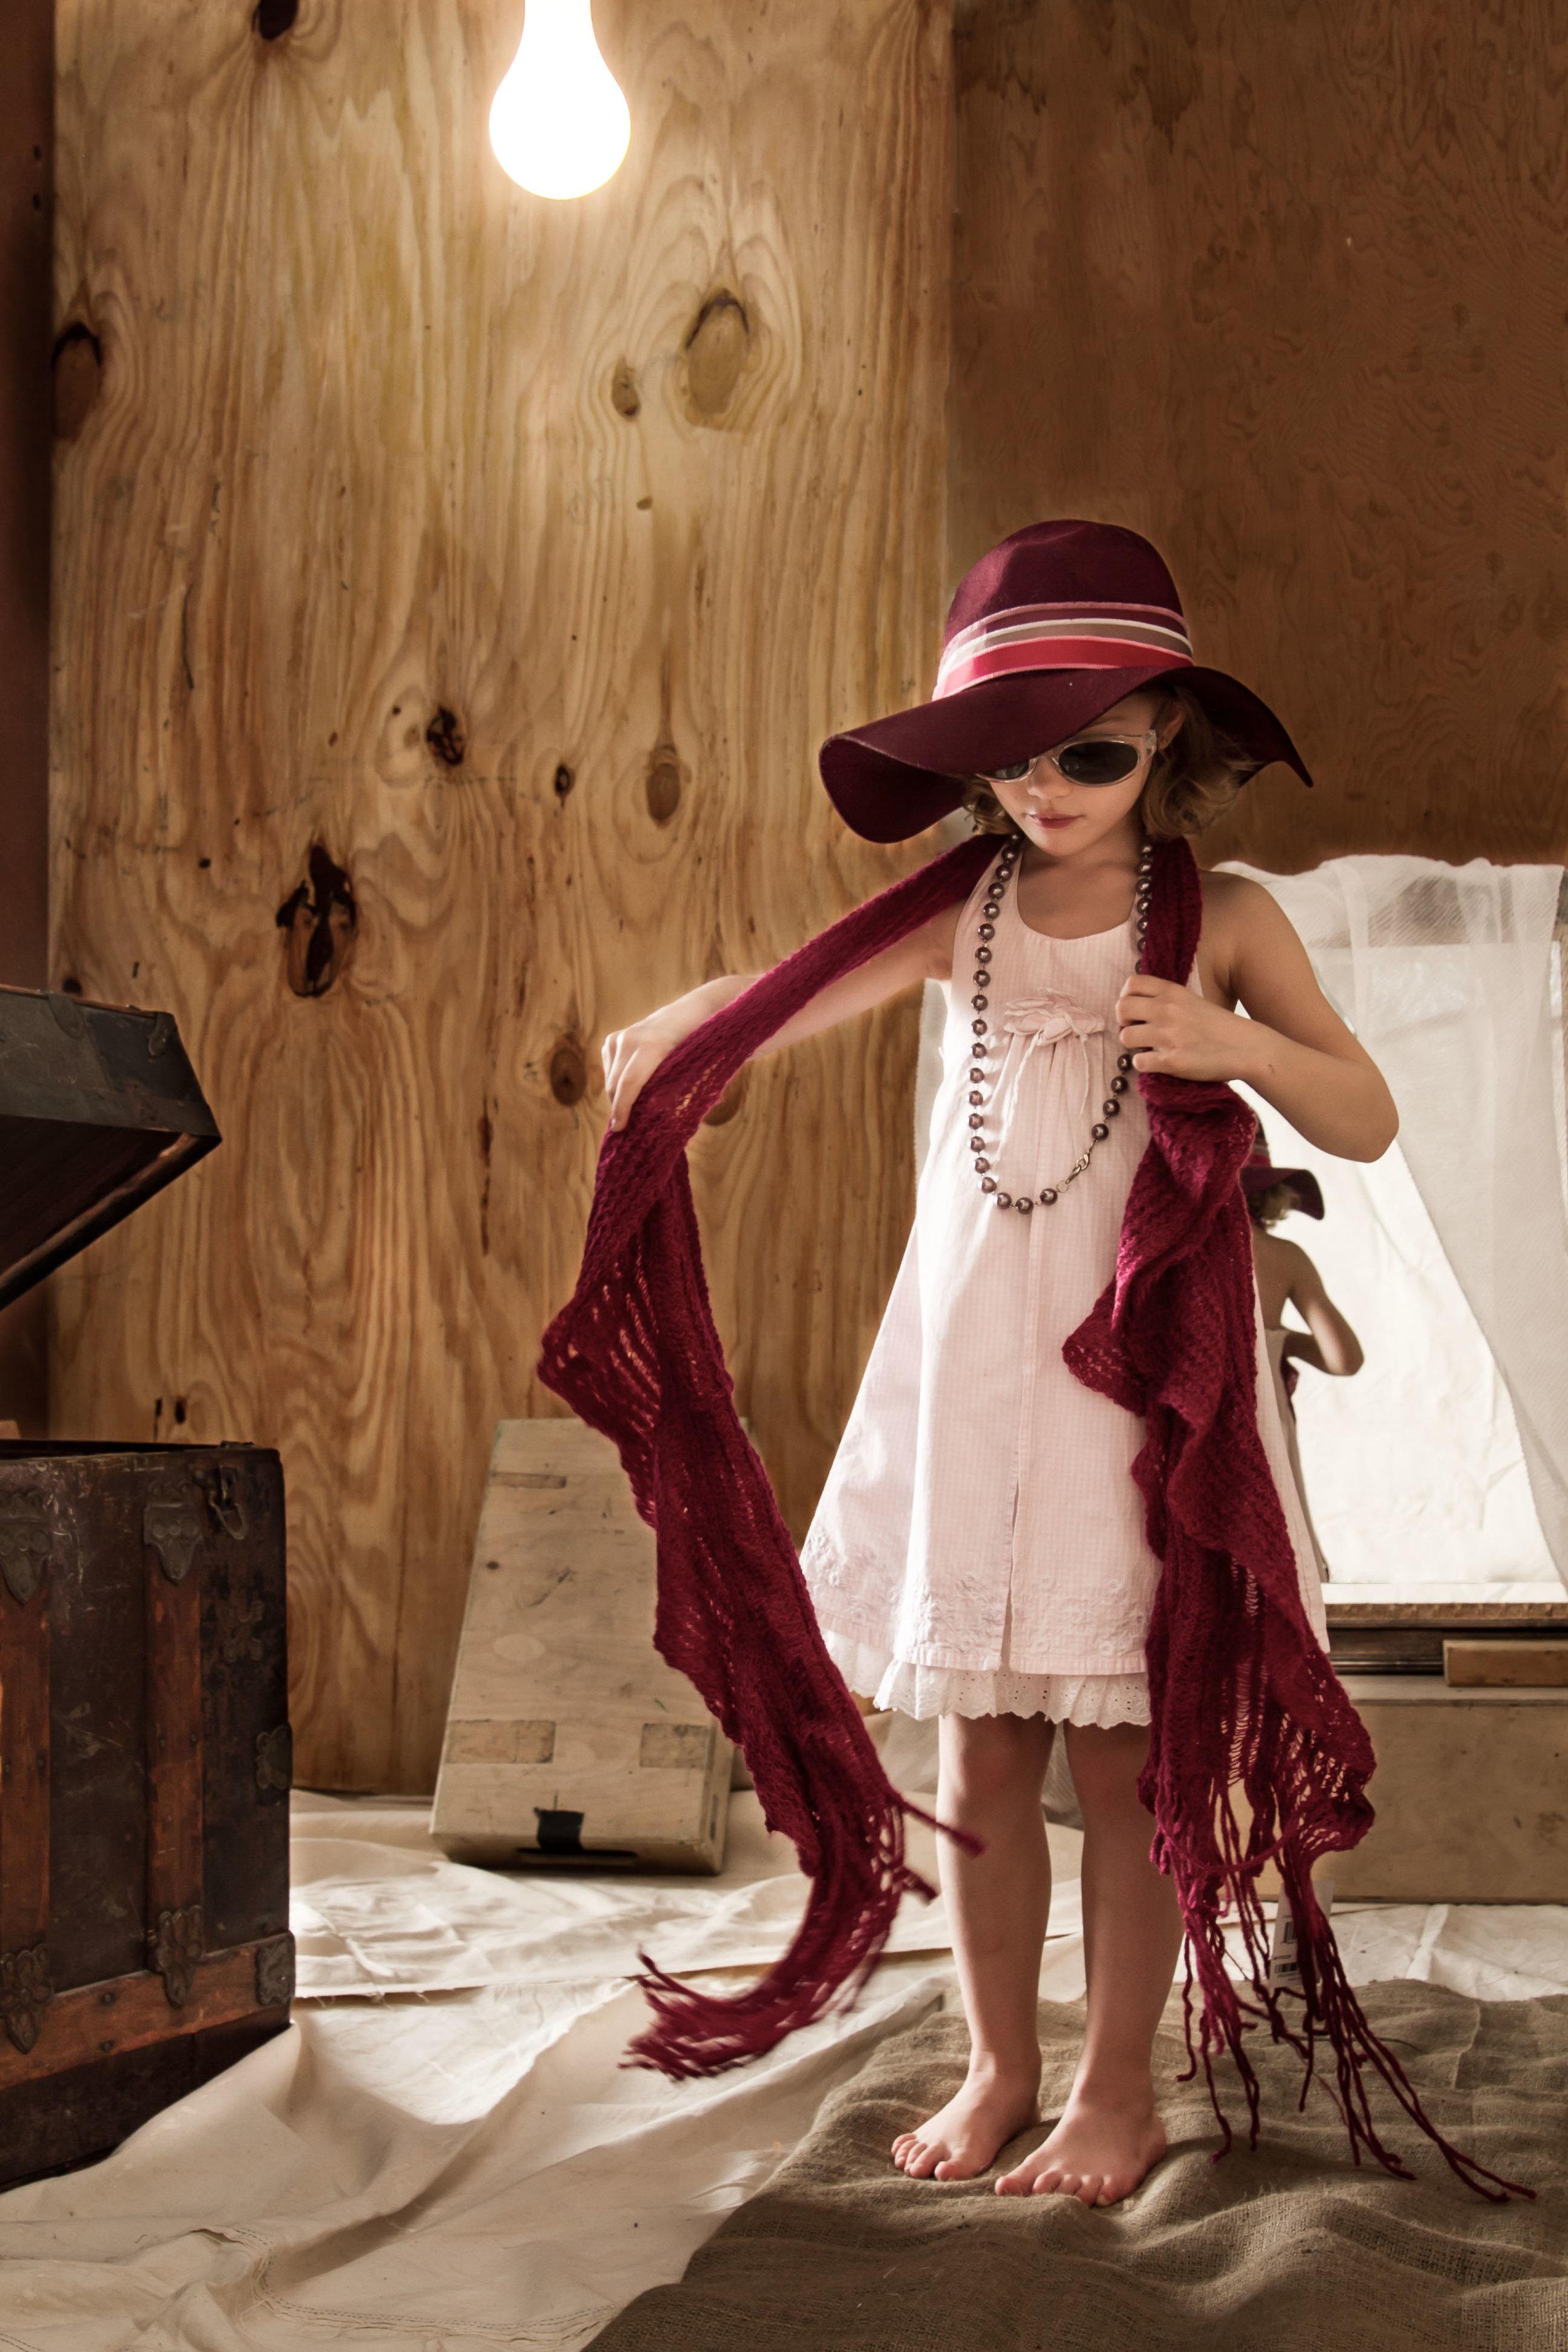 Little Girl Playing Dress-up.jpg